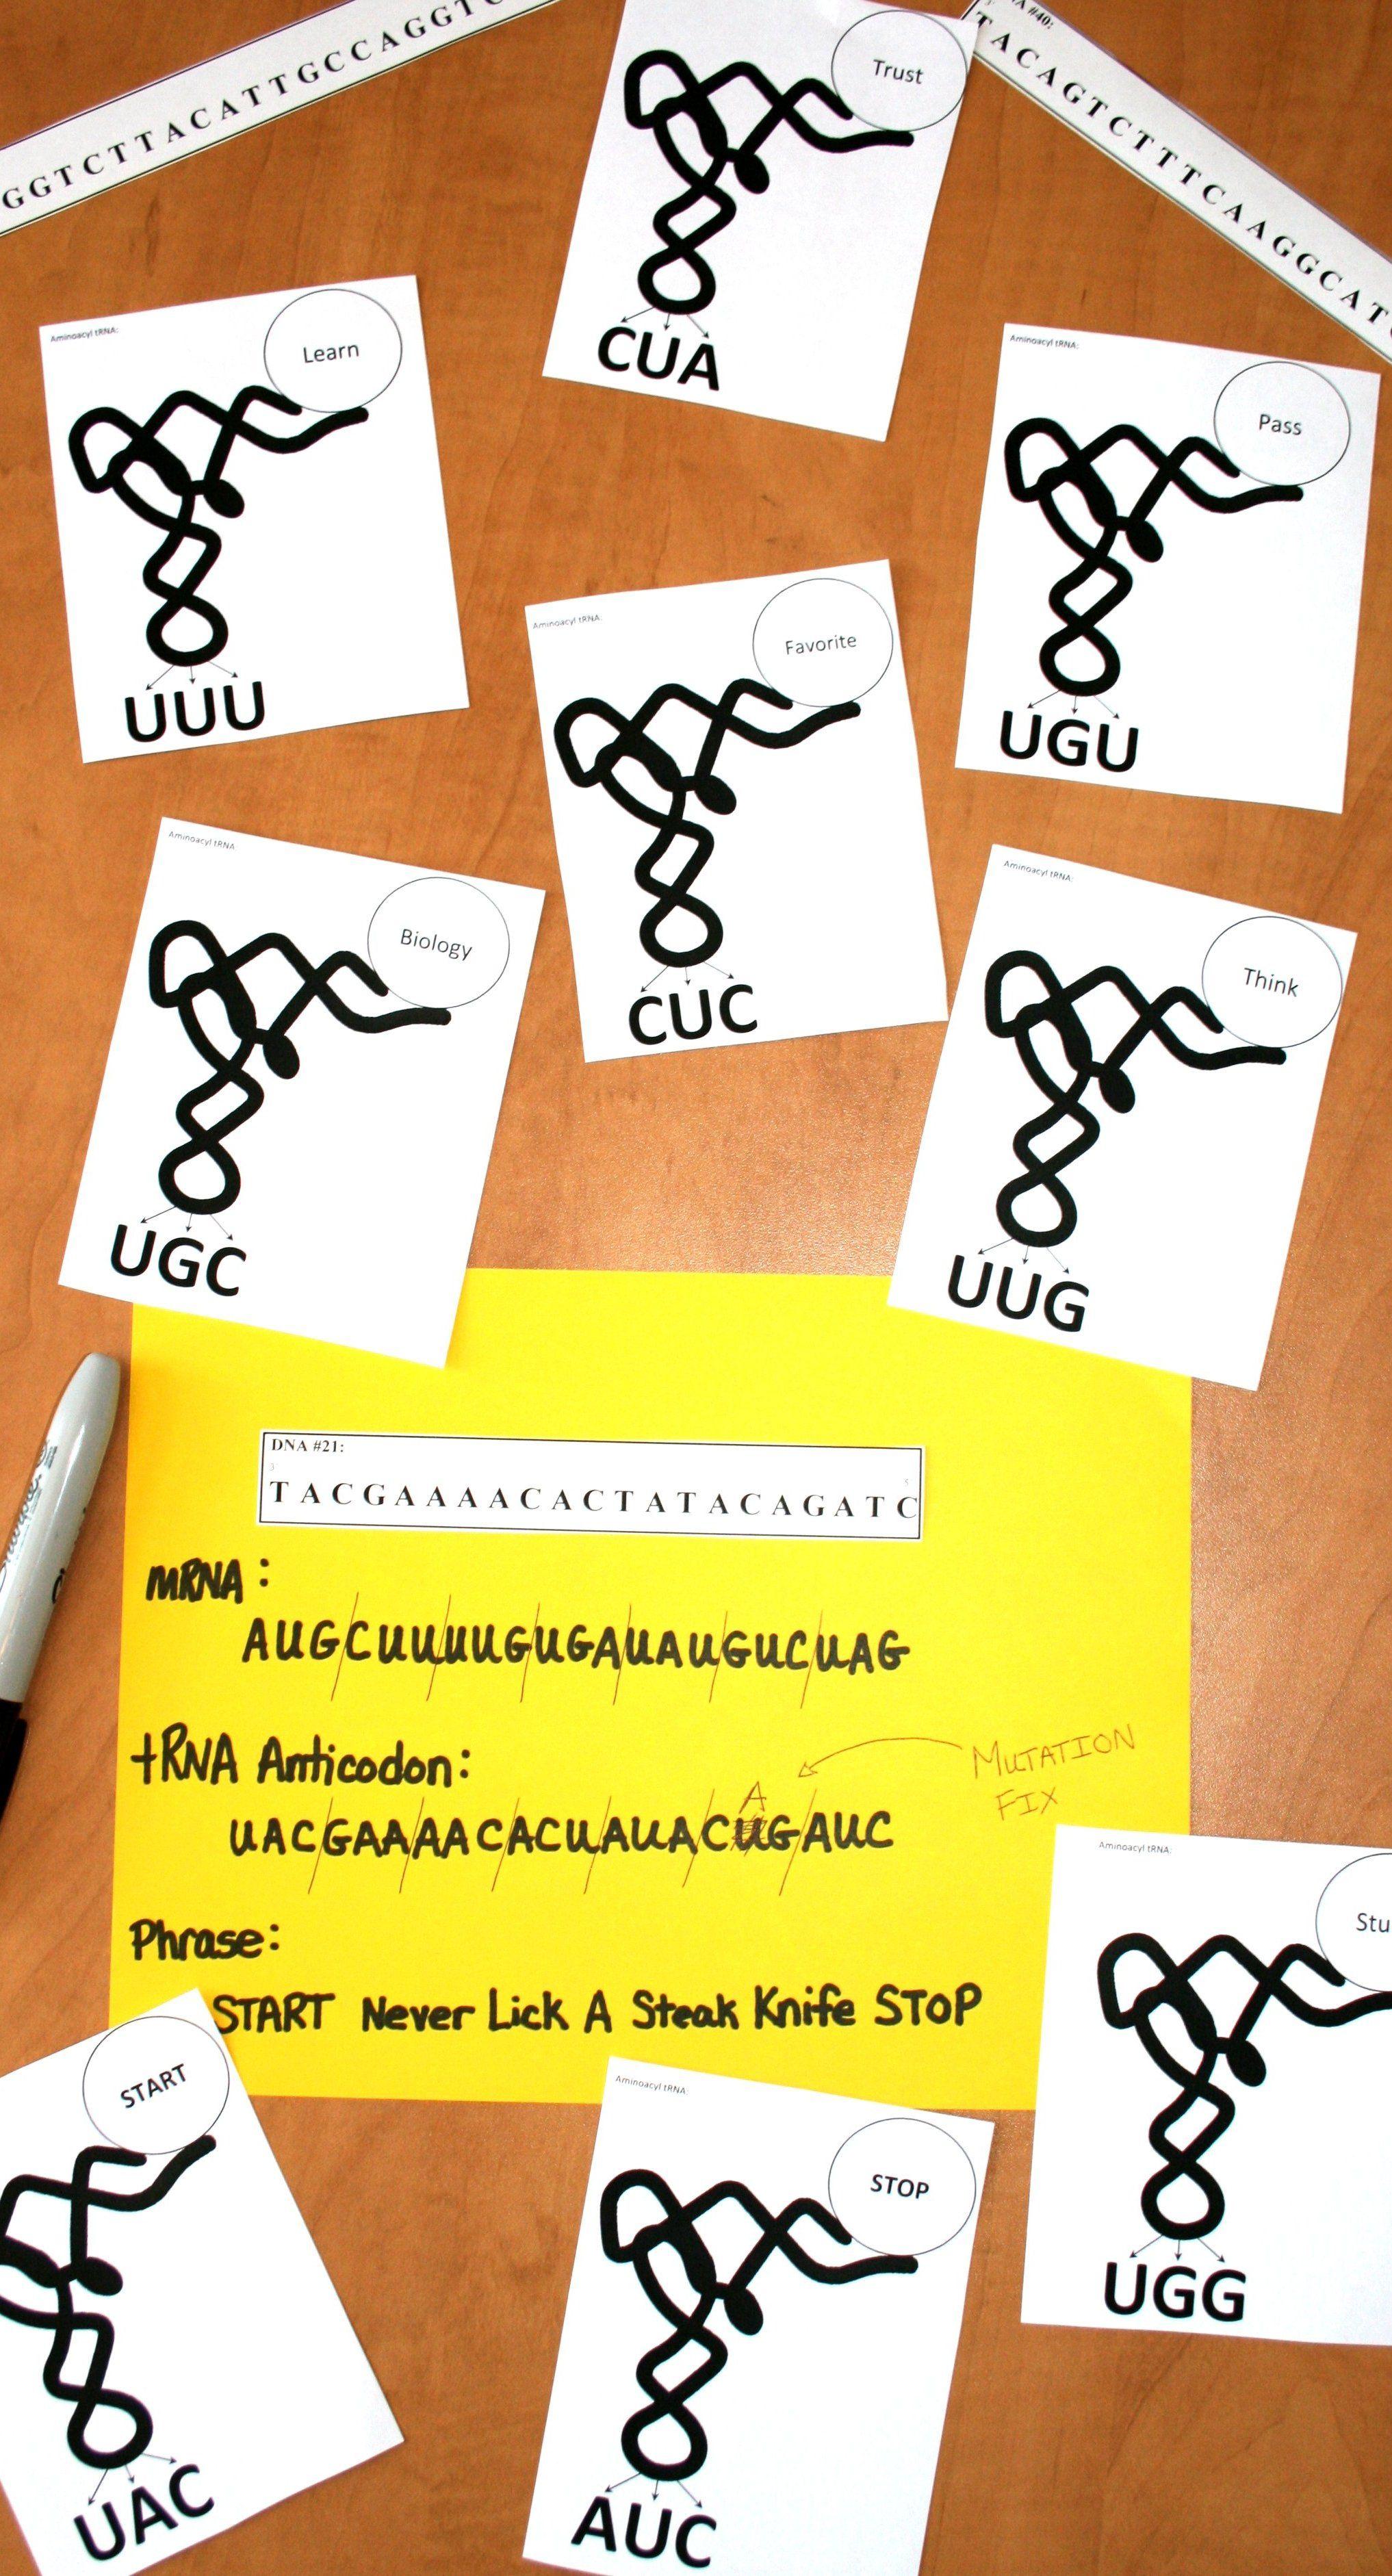 Genetics Dna Transcription Amp Translation With Words Dry